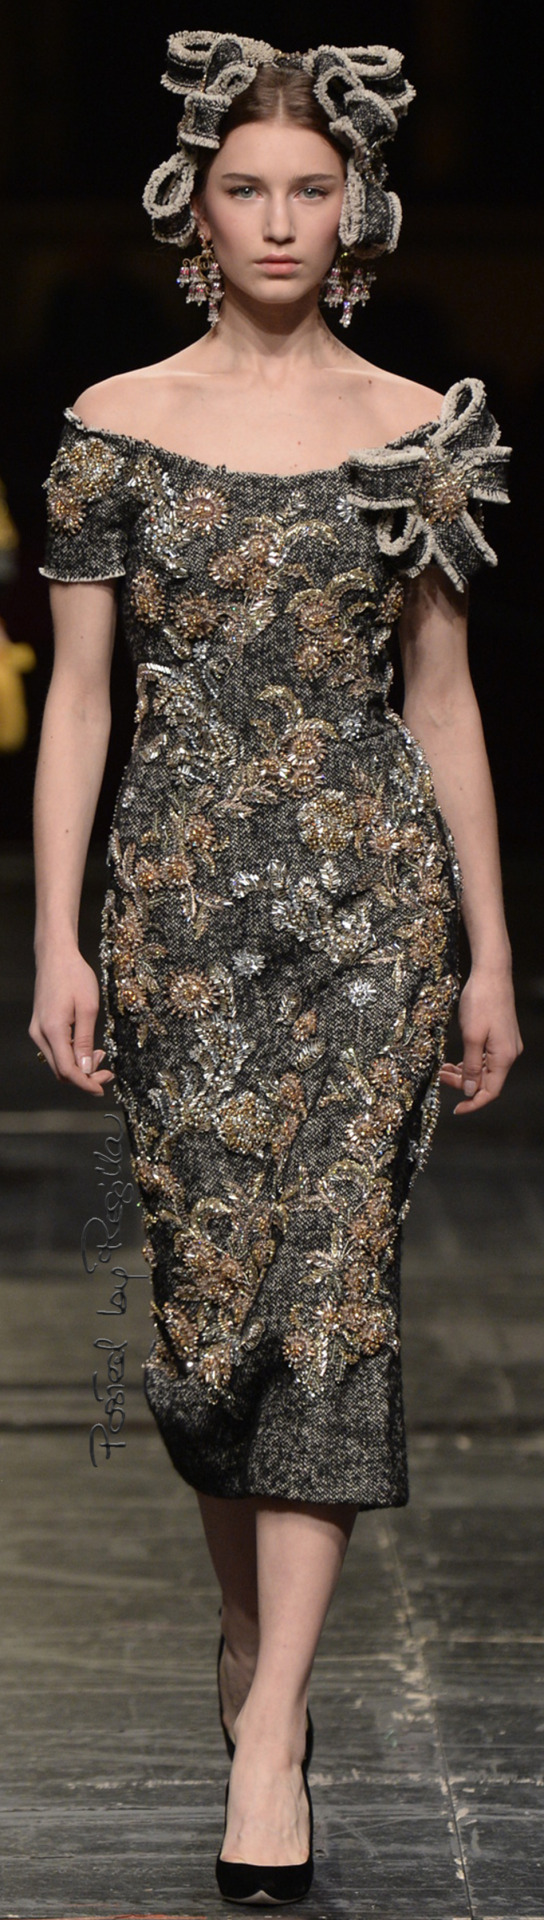 Regilla ⚜ Dolce & Gabbana, Alta Moda 2016